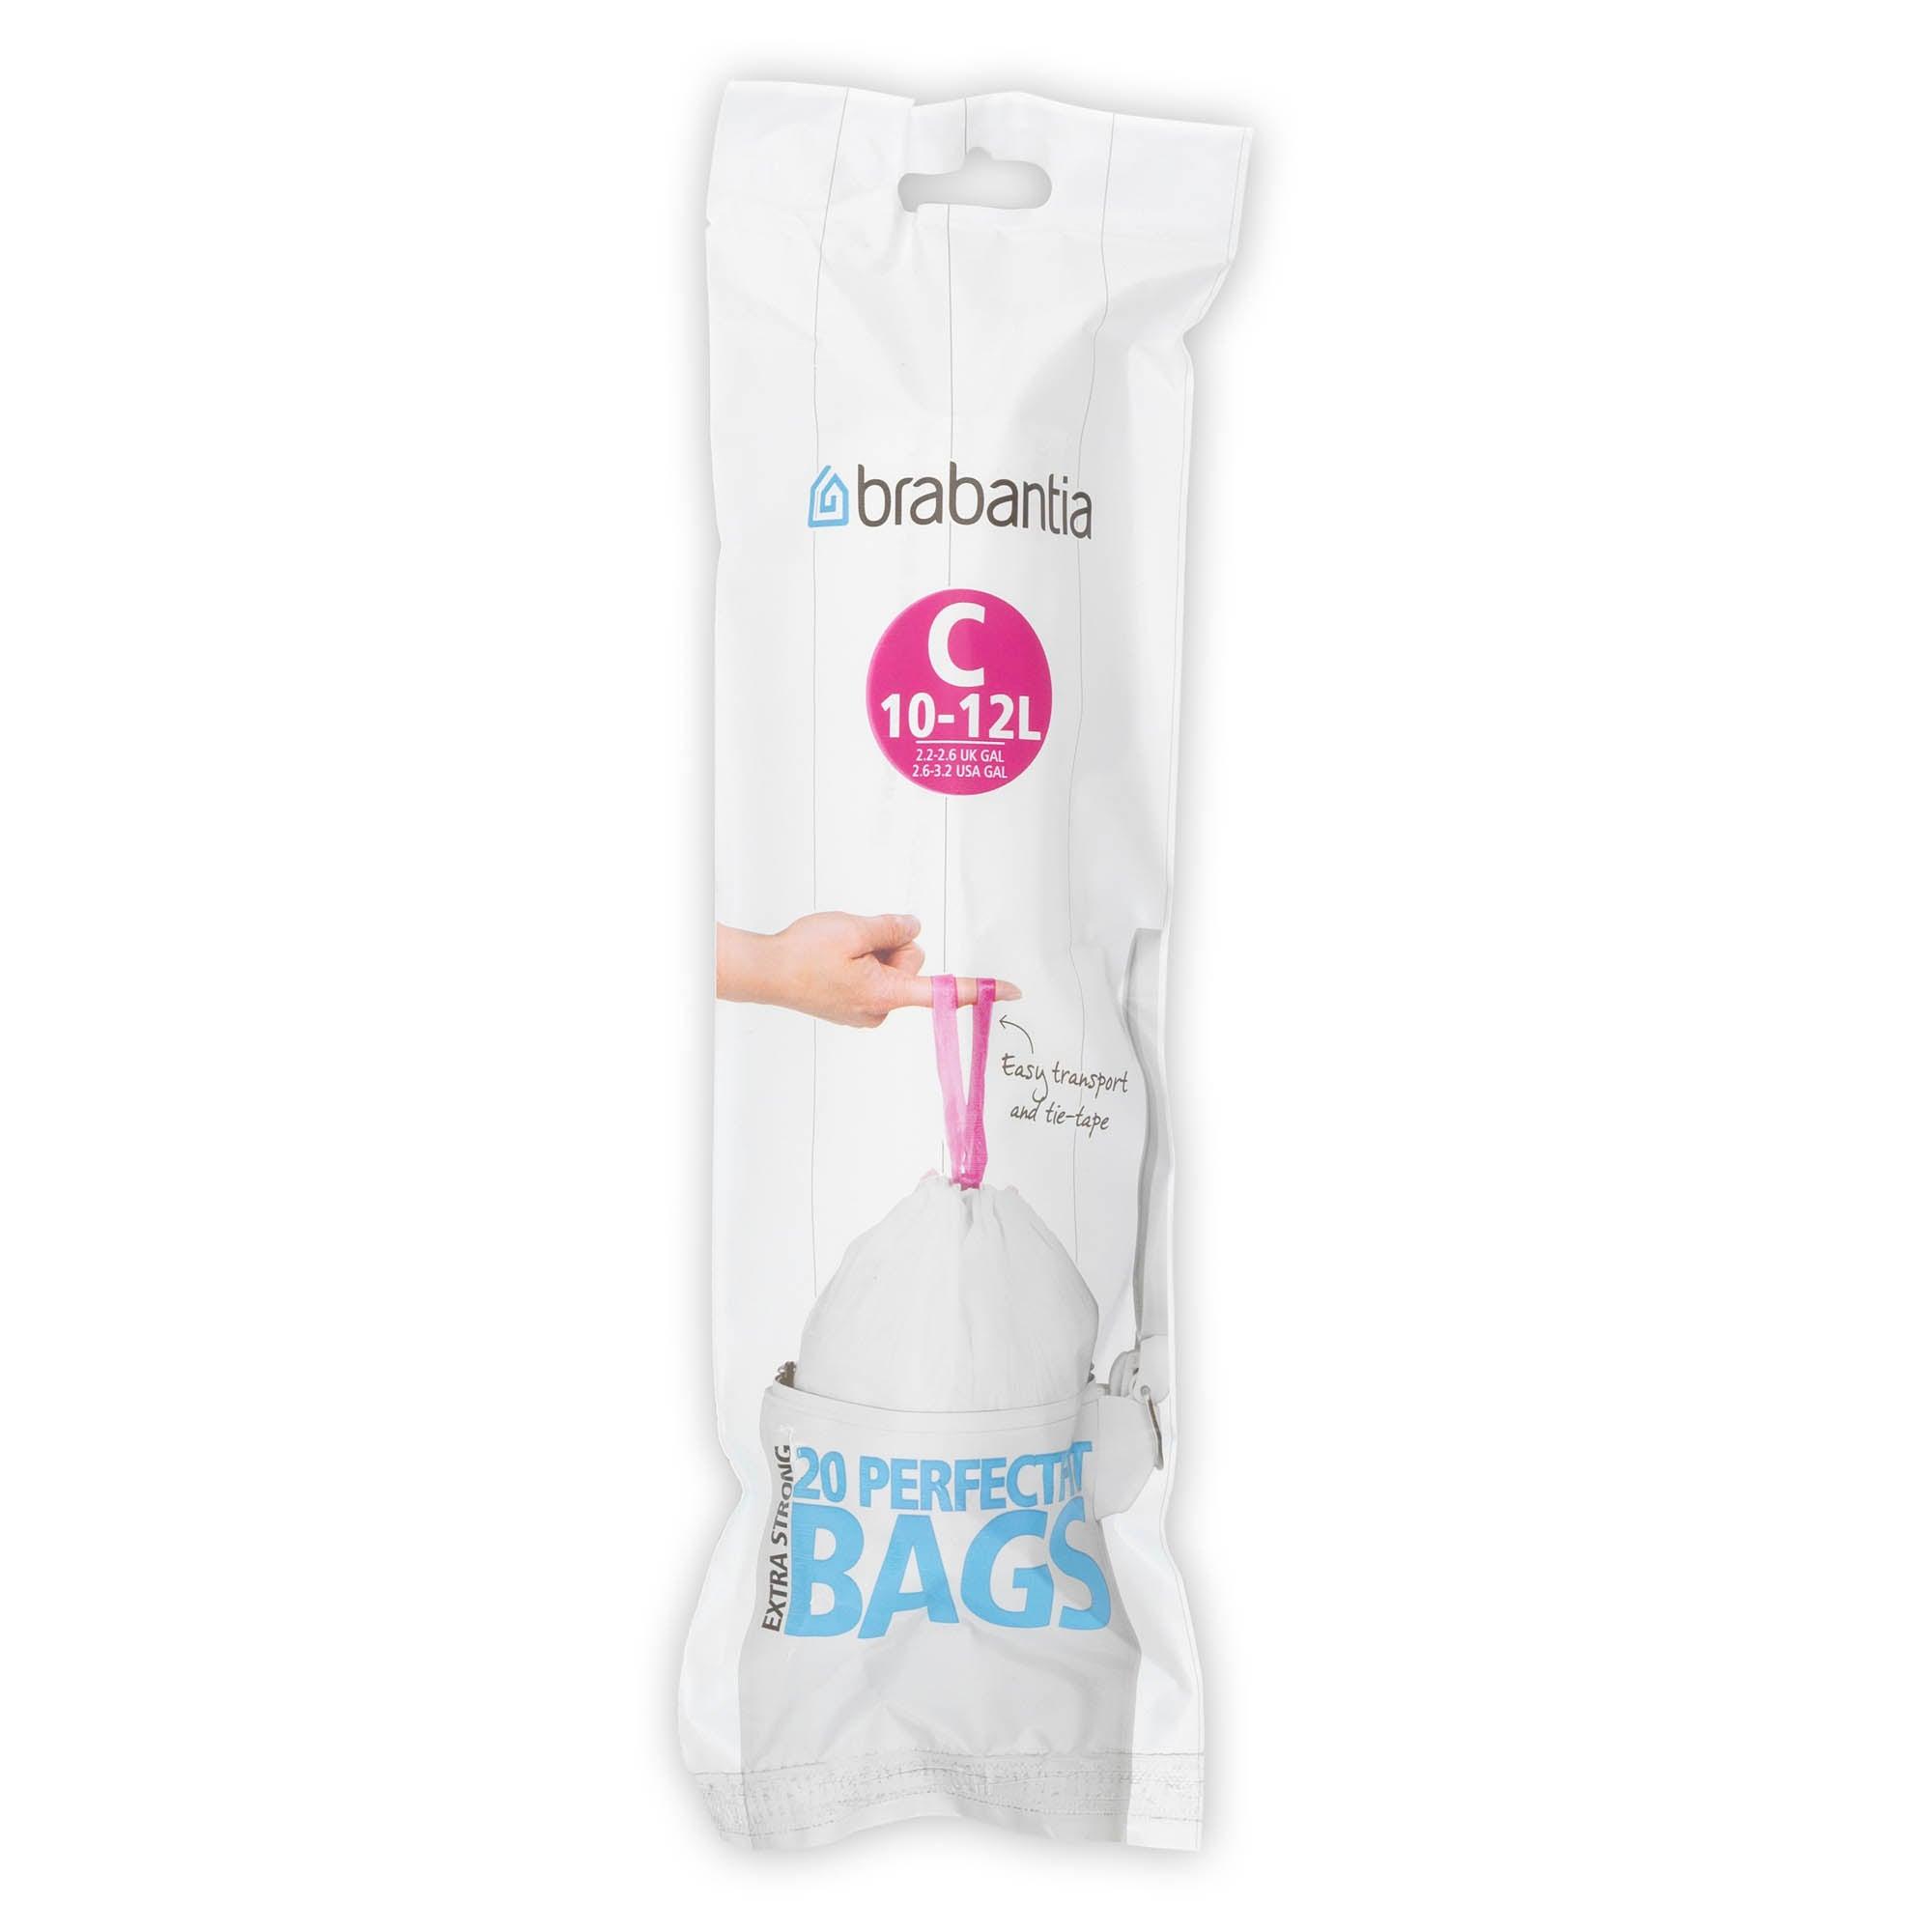 Brabantia 12 Litre Waste Bags